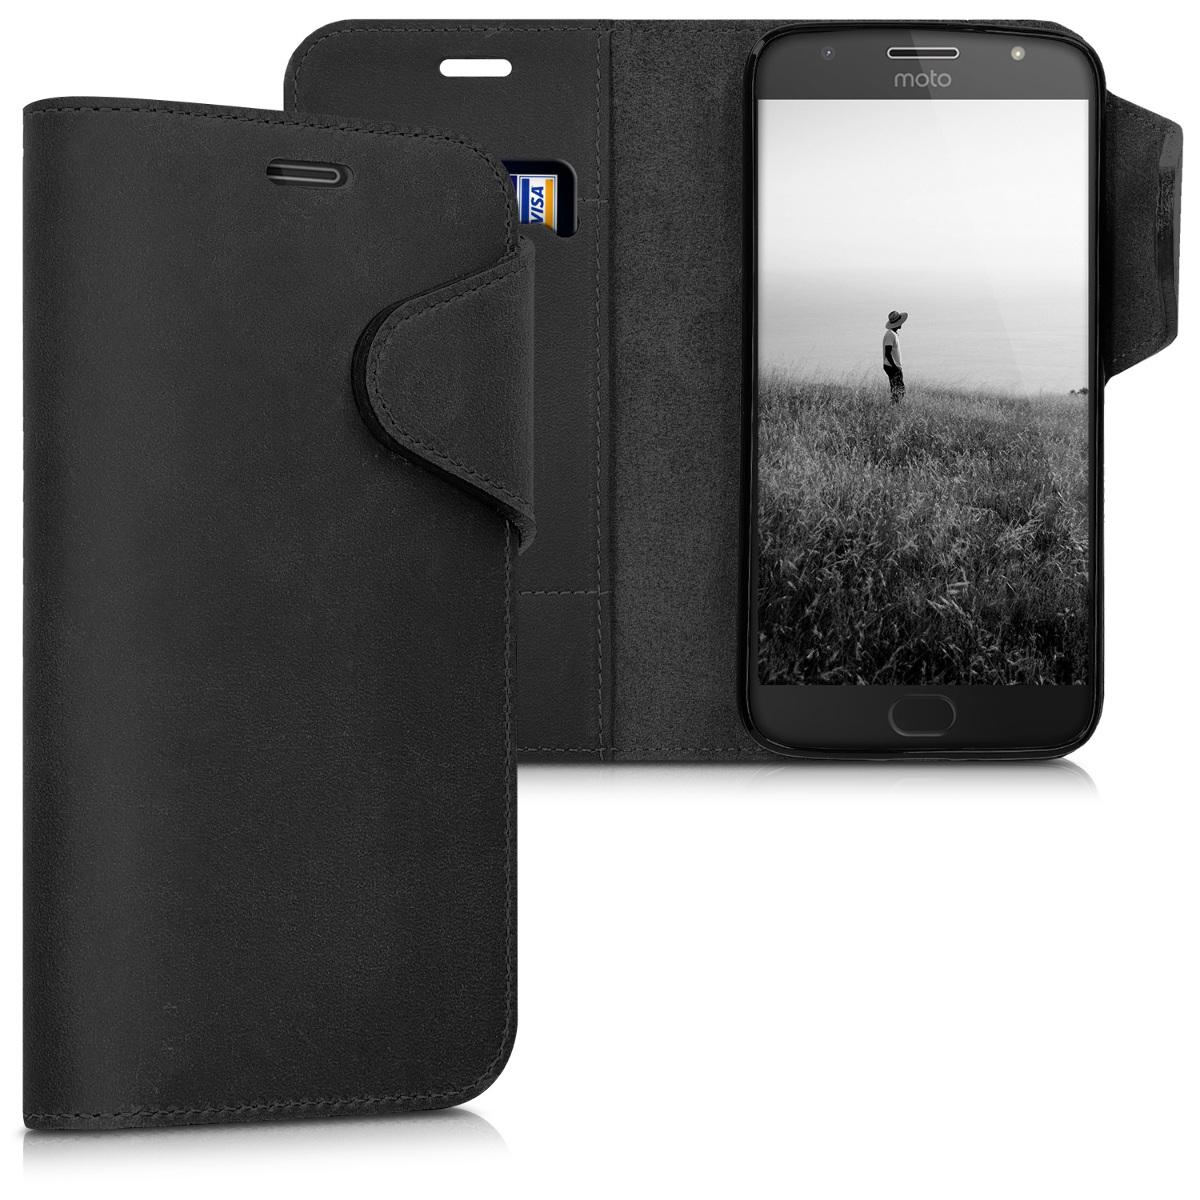 Kožené pouzdro | obal pro Motorola Moto G5S Plus - Černá